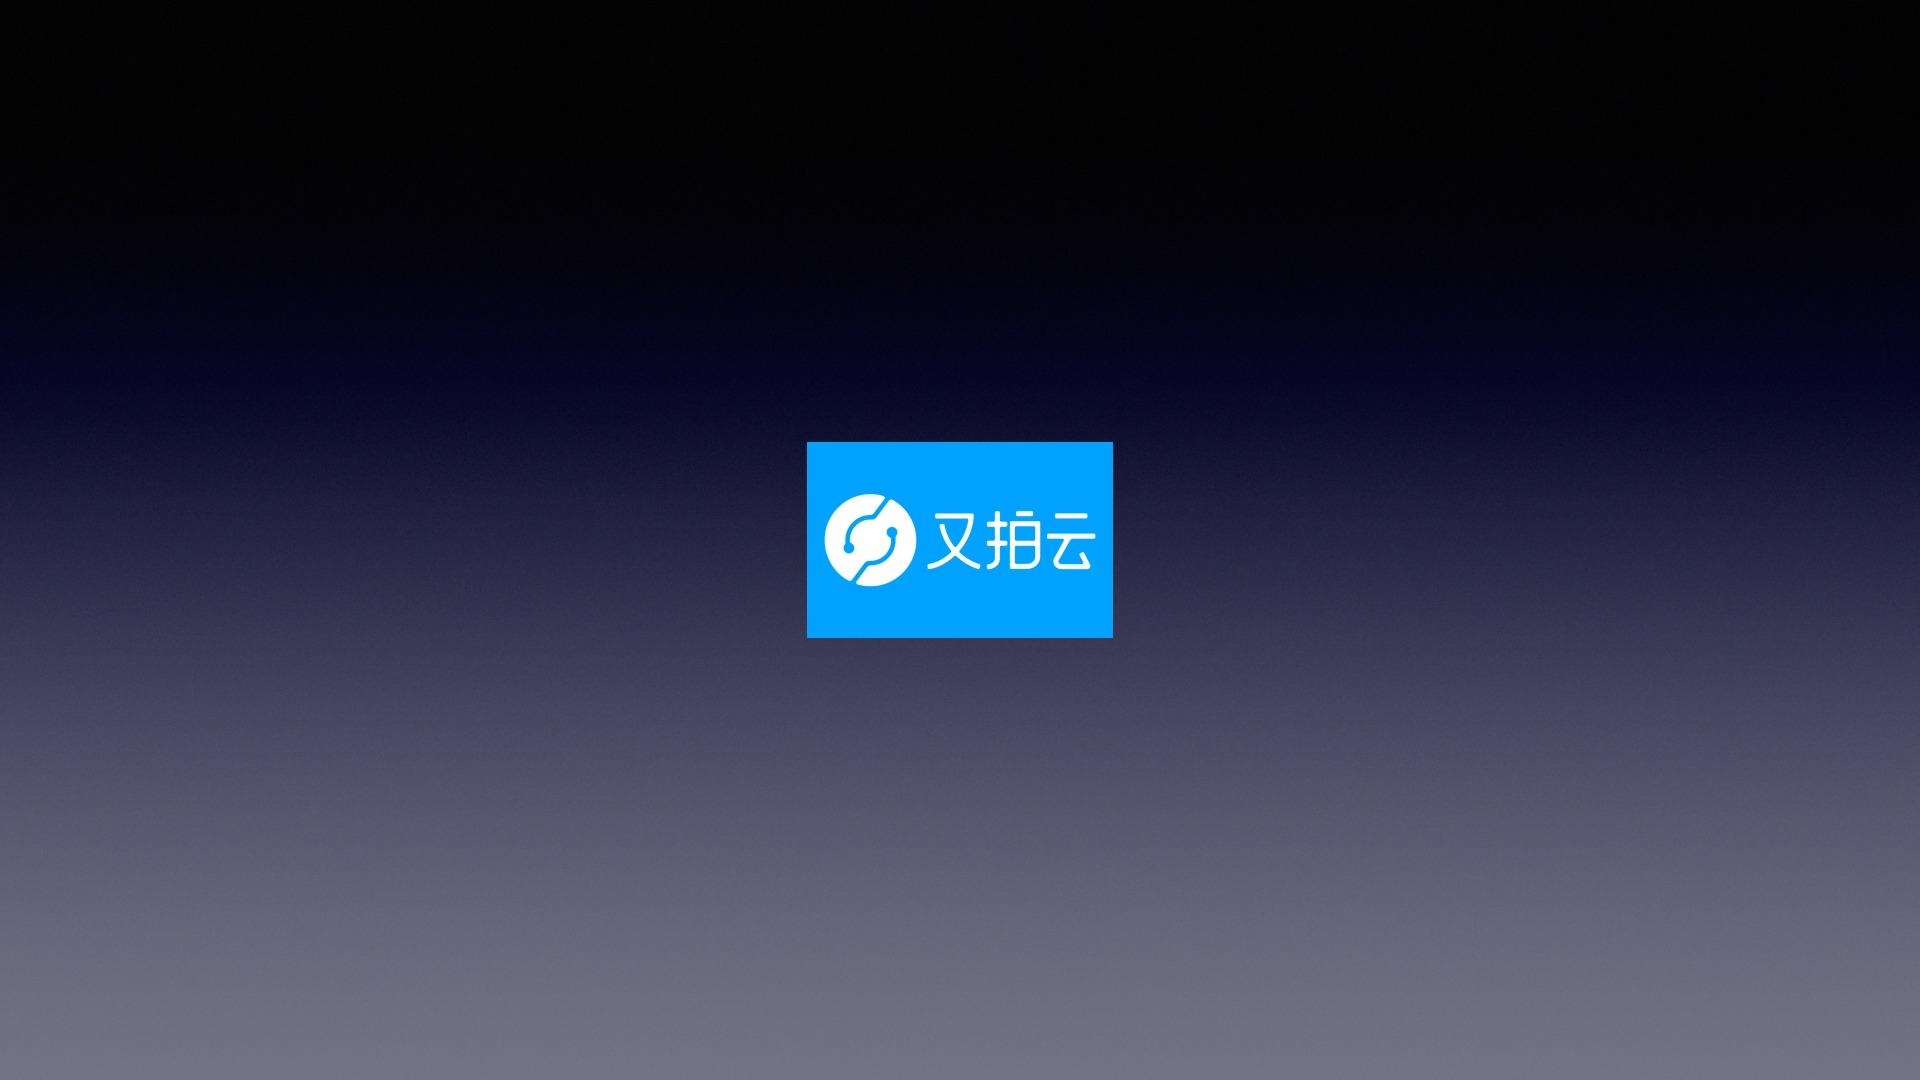 https://opentalk-blog.b0.upaiyun.com/prod/2018-12-18/03141163ad45194a9edd72880b2bc345